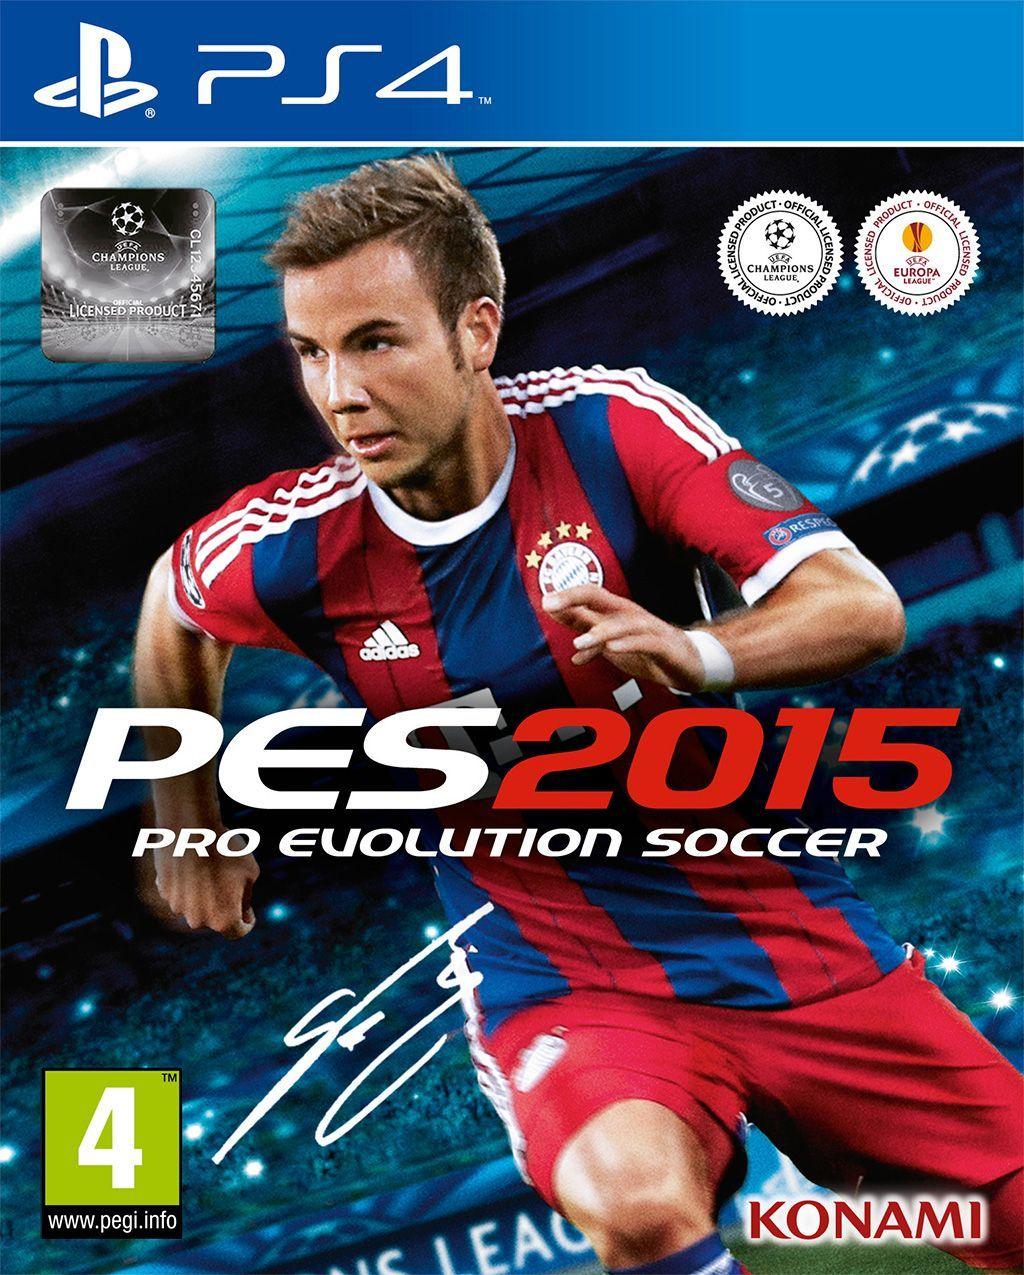 046778e497 Americanas Game Pro Evolution Soccer 2015 - PS4 - R 29